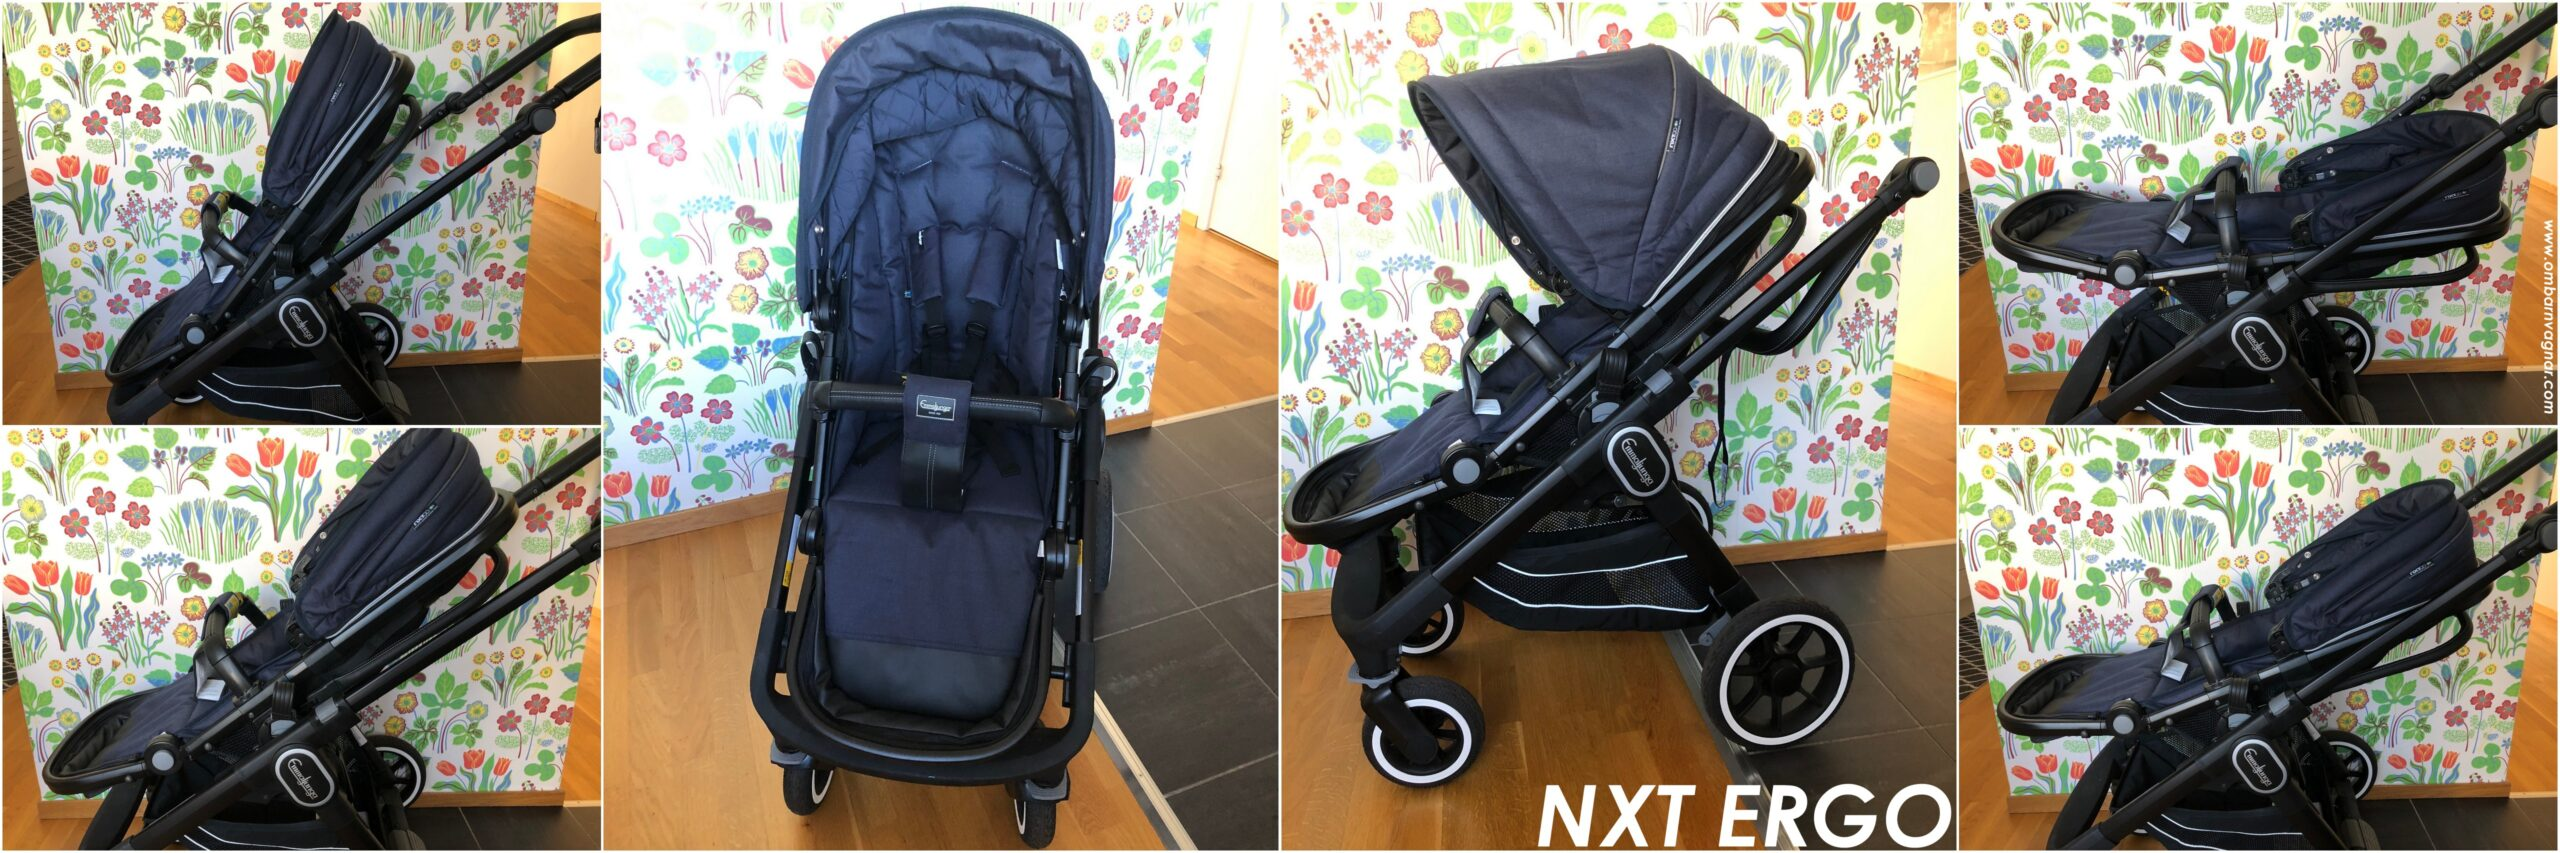 Recension av Emmaljunga NXT60 med ergonomisk sittdel